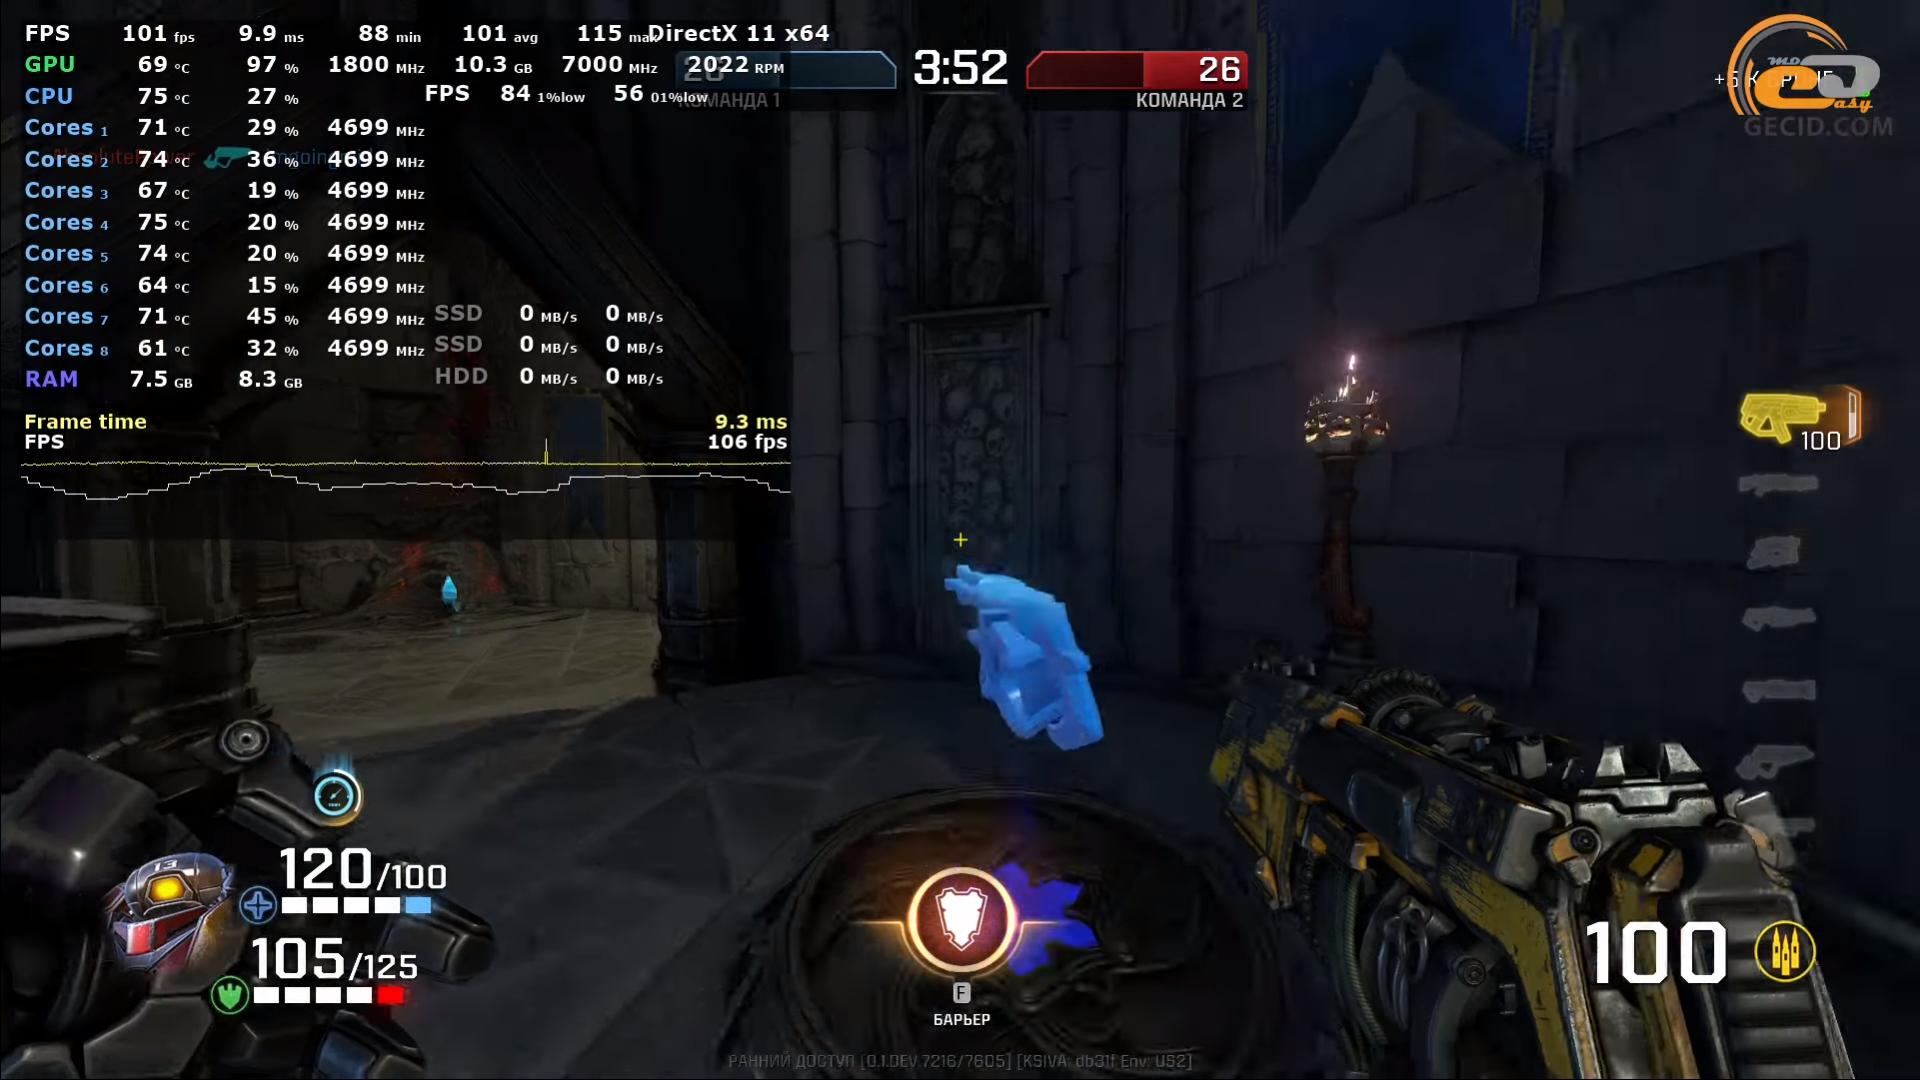 3Gb Crysis 3 Witcher 3 Tomb Rider Gta 5 Paragon Full – Meta